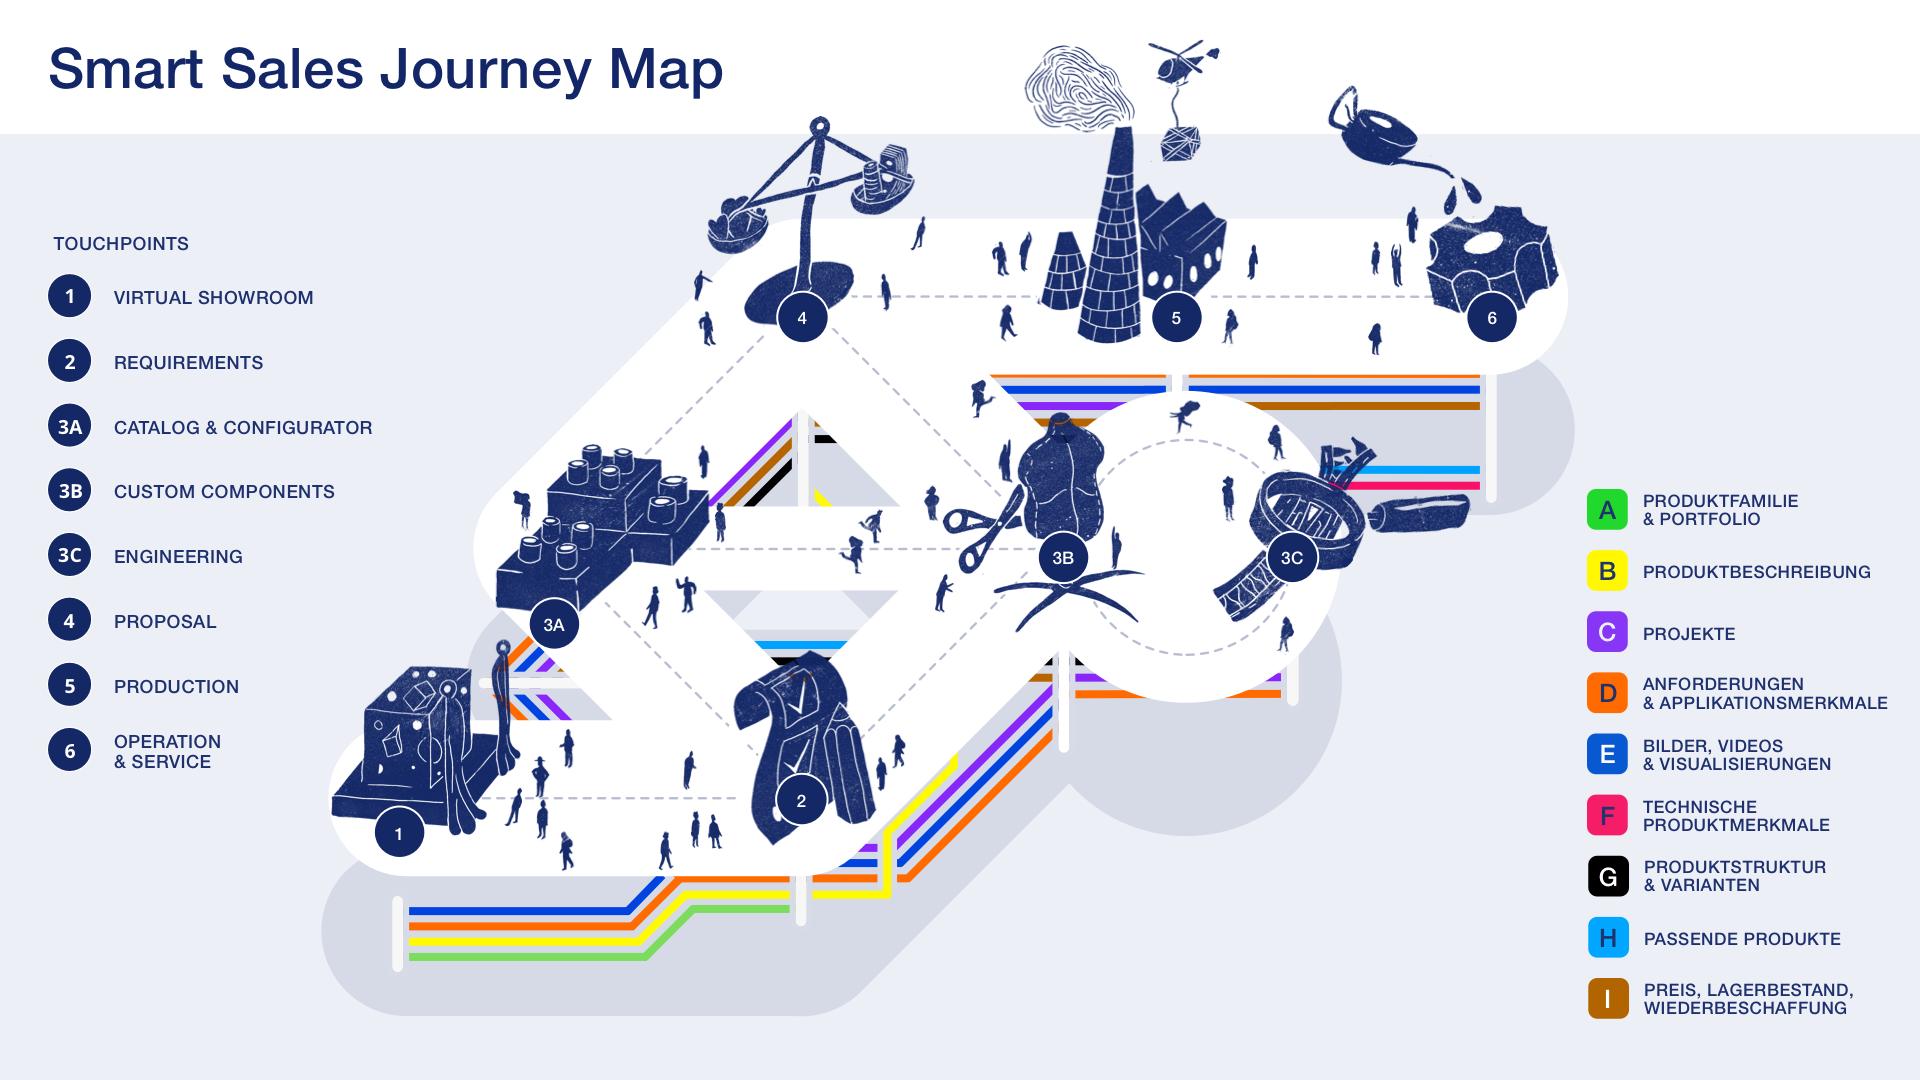 Smart Sales Journey Map mit Labes